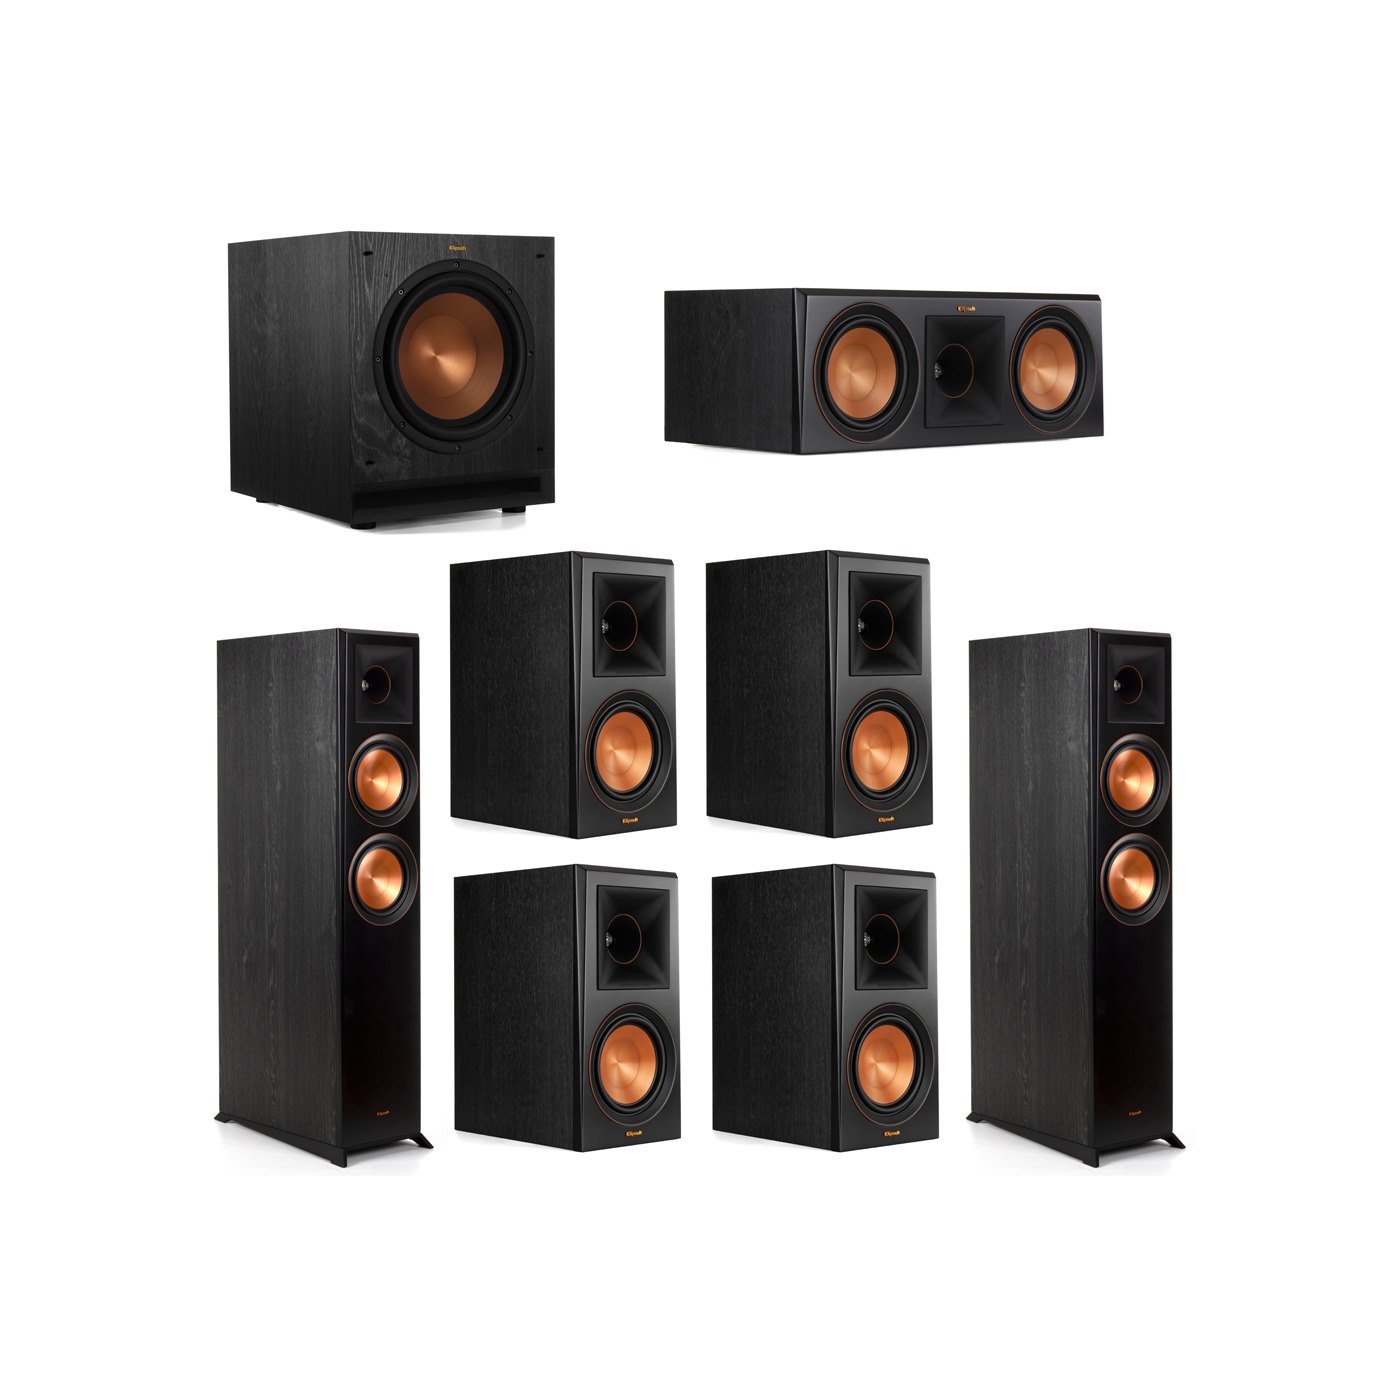 Klipsch 7.1 System with 2 RP-6000F Floorstanding Speakers, 1 Klipsch RP-600C Center Speaker, 4 Klipsch RP-600M Surround Speakers, 1 Klipsch SPL-100 Subwoofer